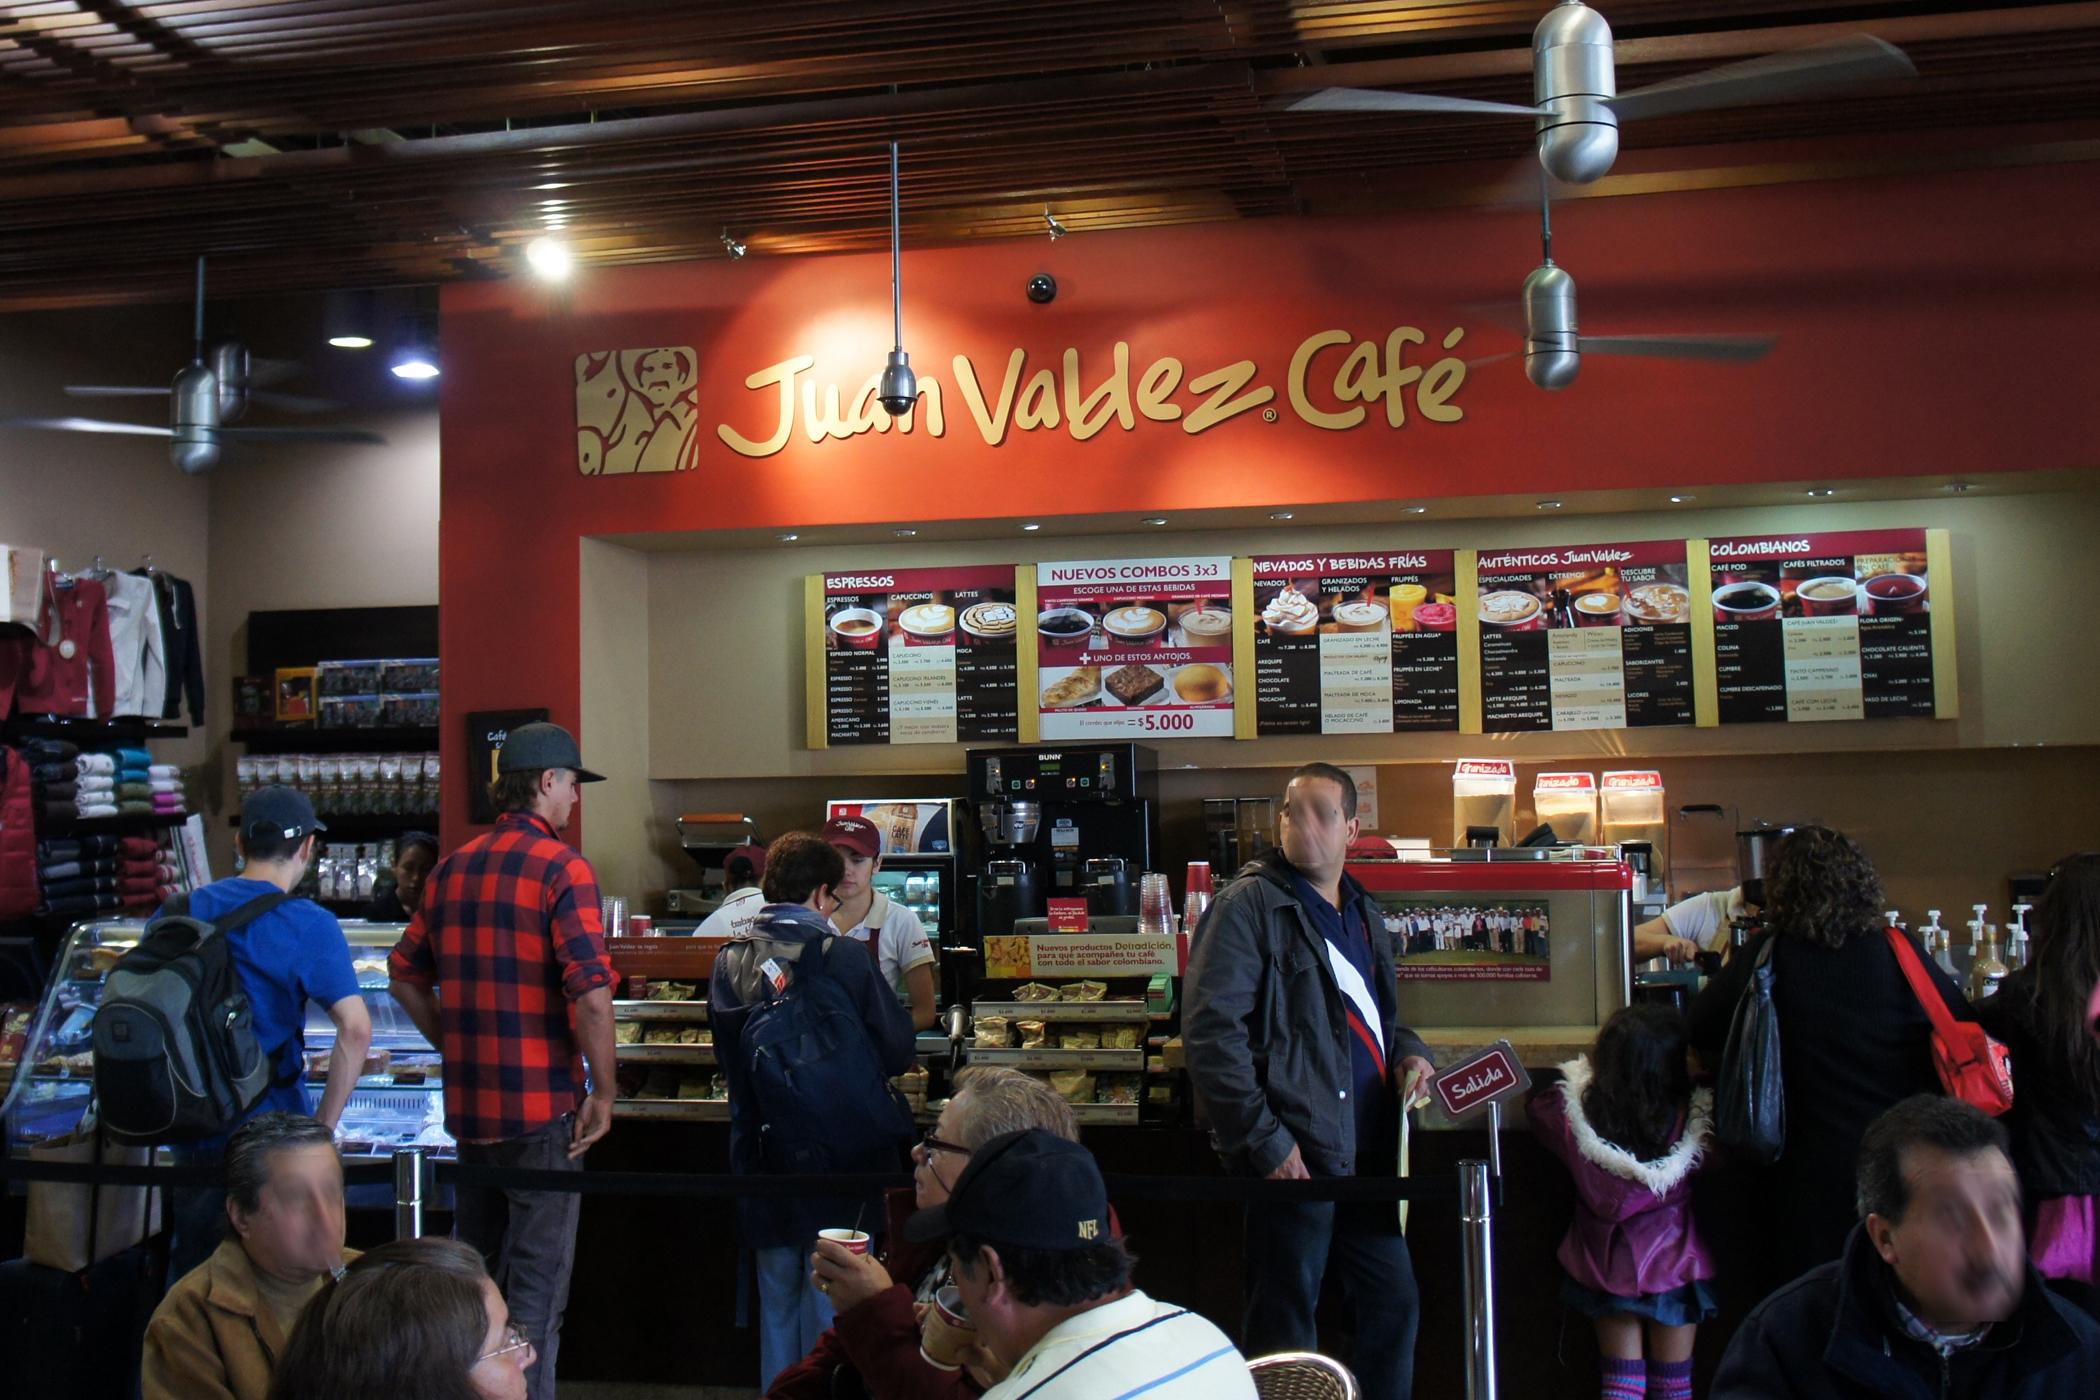 Juan Valdez Cafe New York City